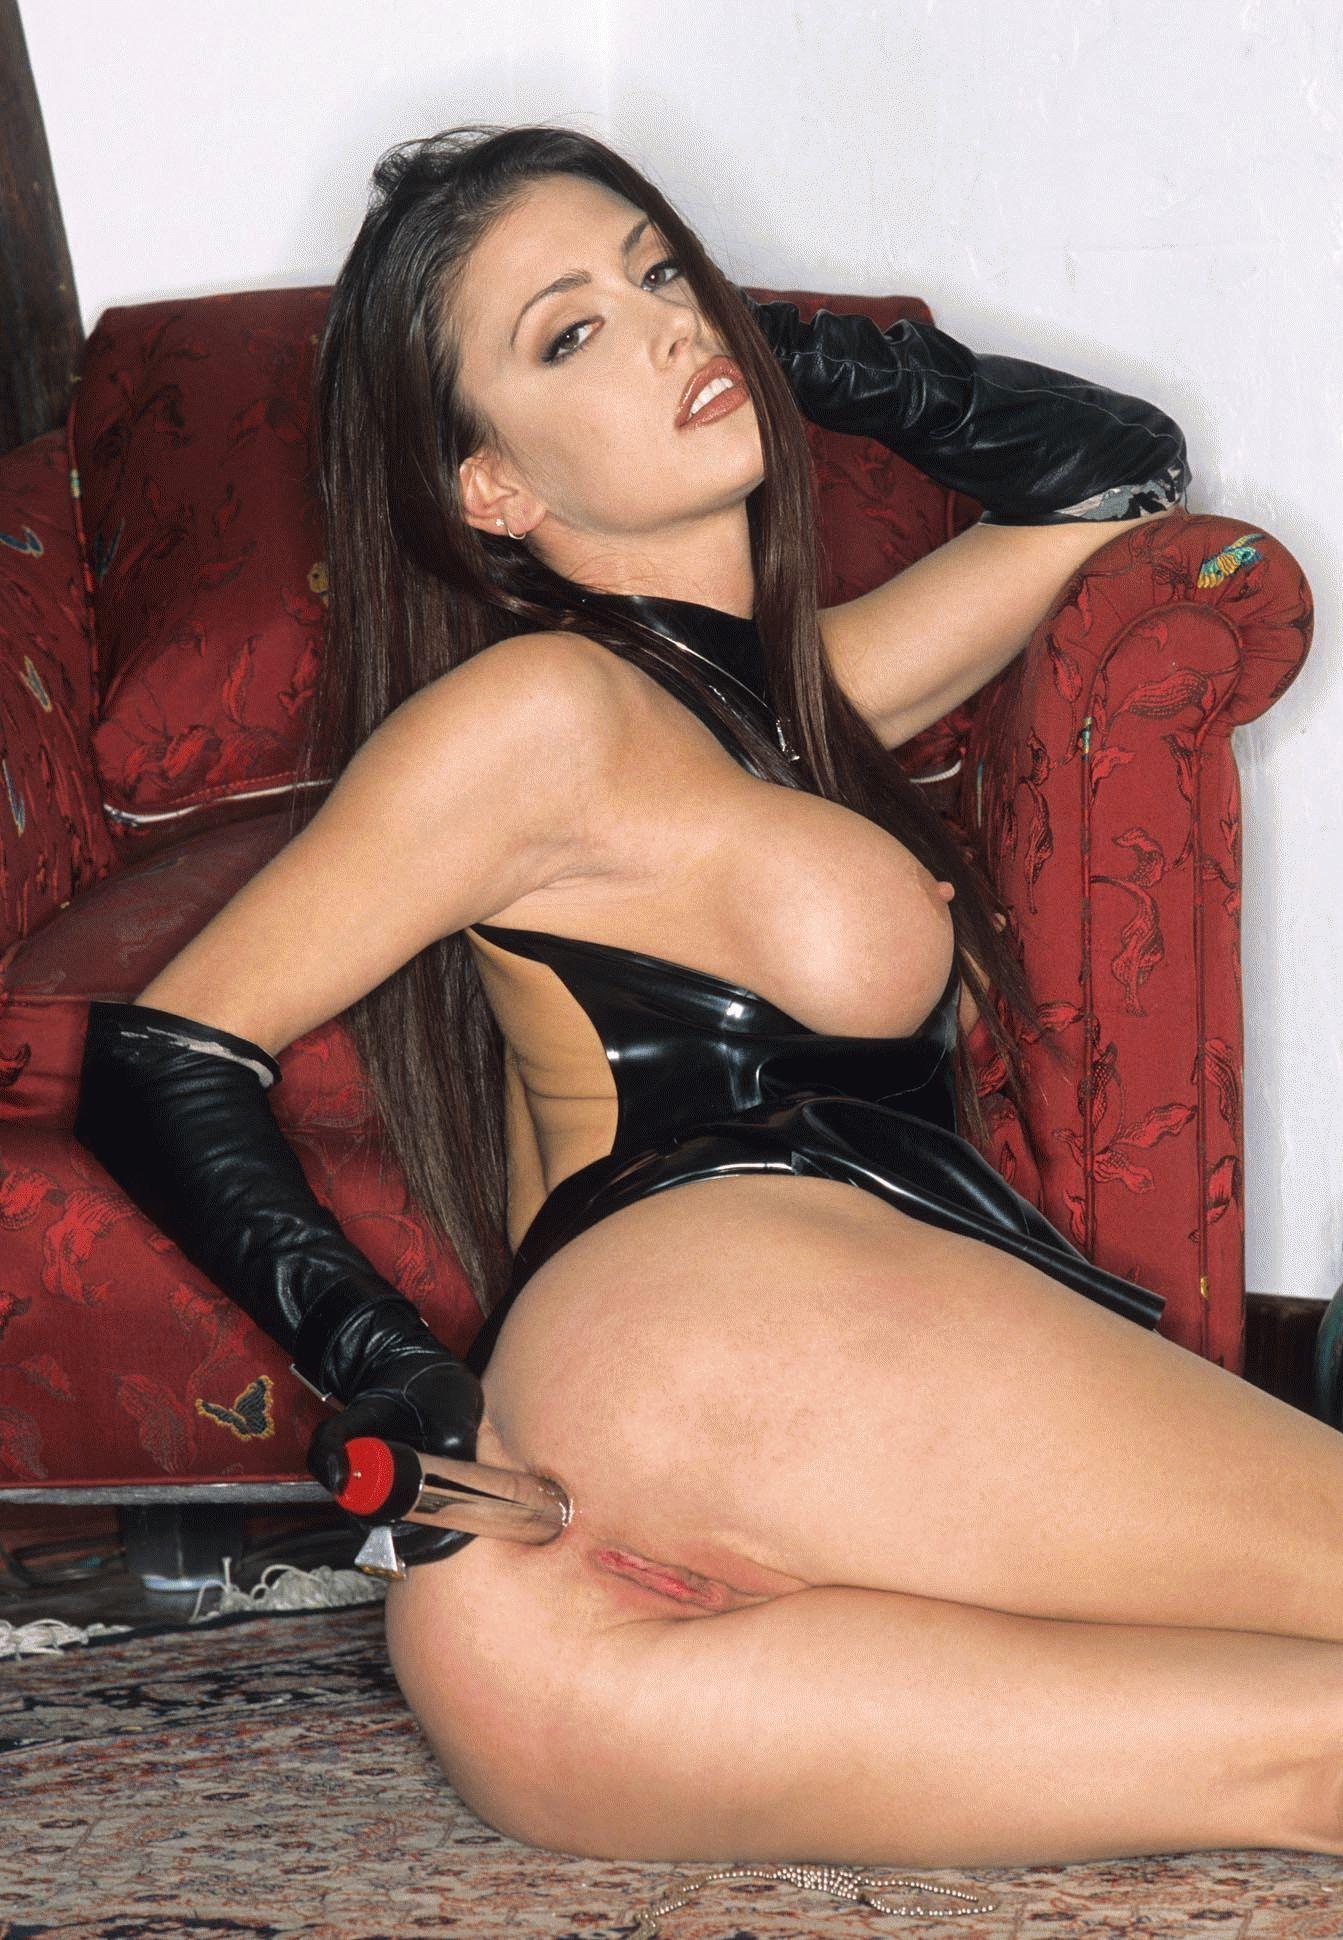 She-male bondage mgp